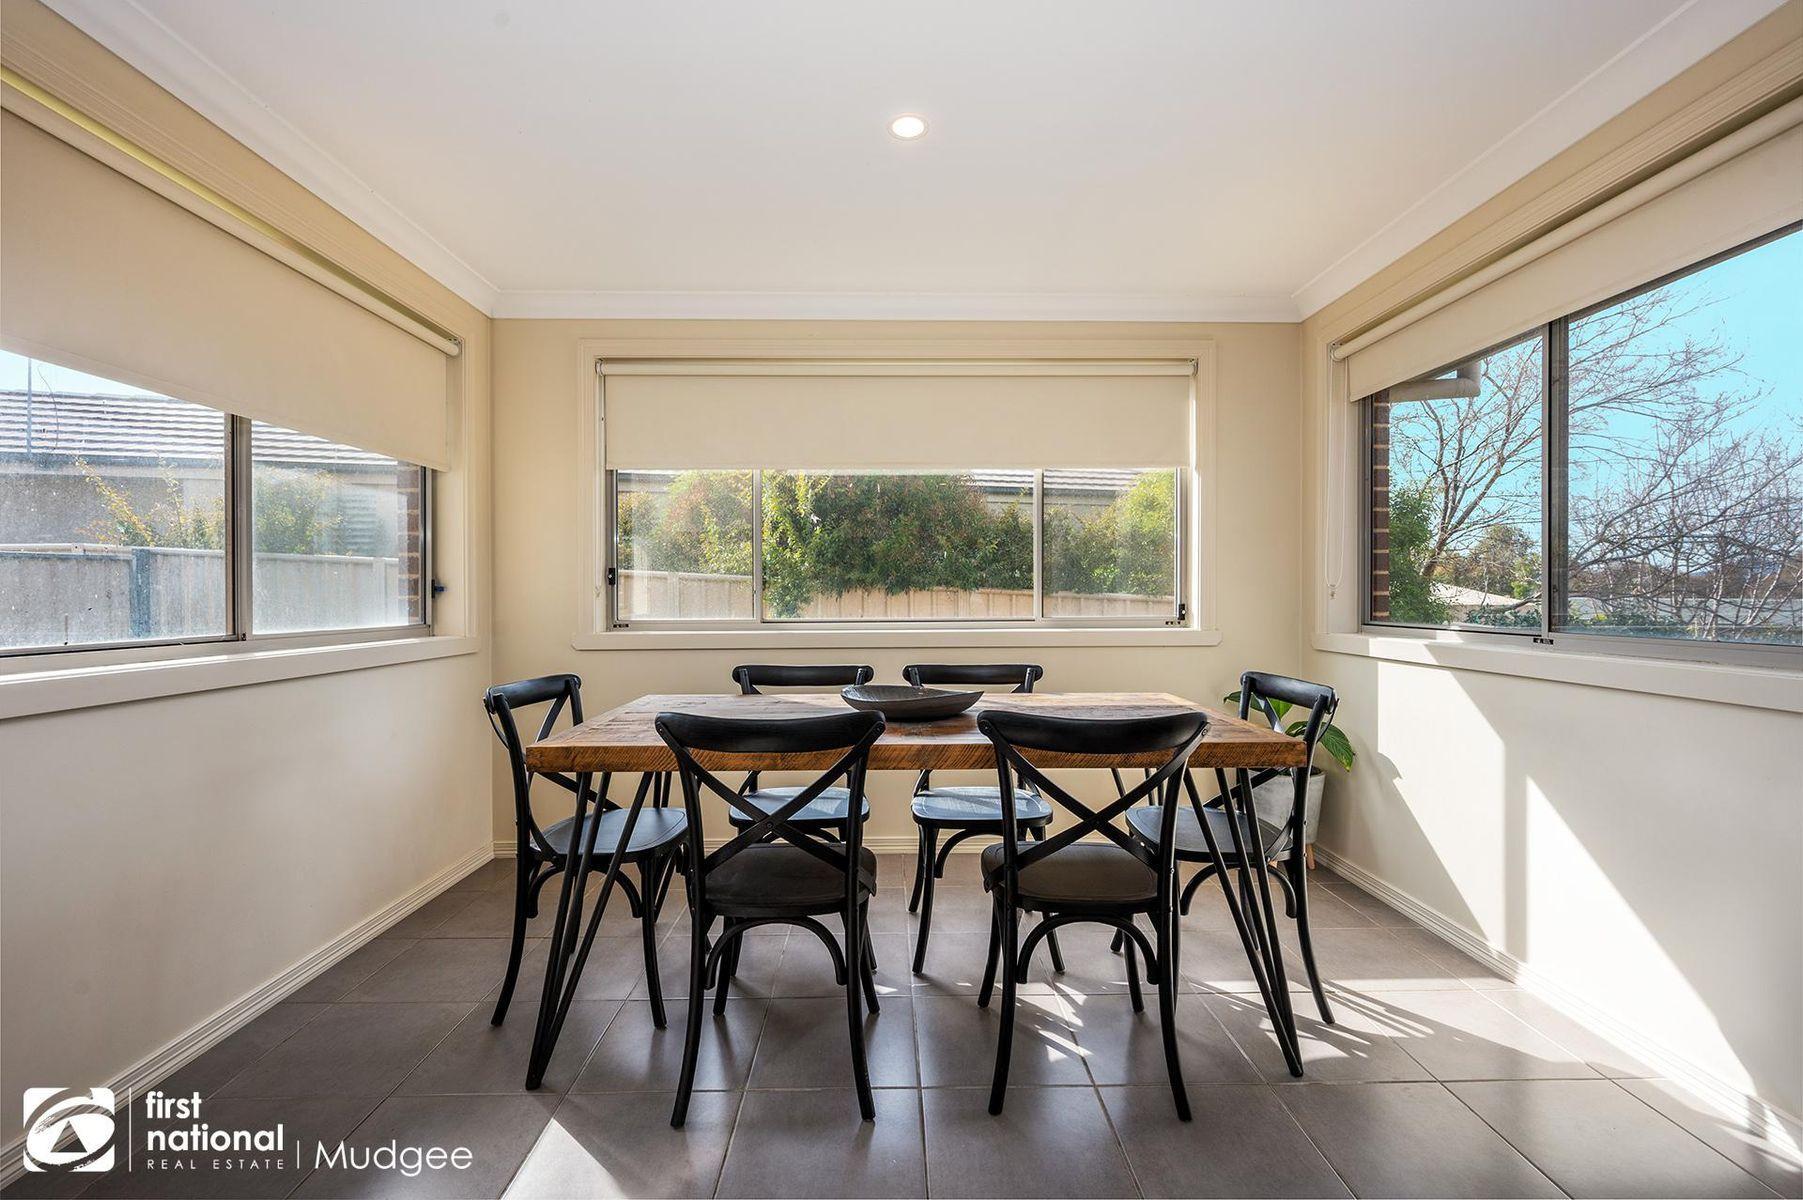 8 Tennant Close, Mudgee, NSW 2850